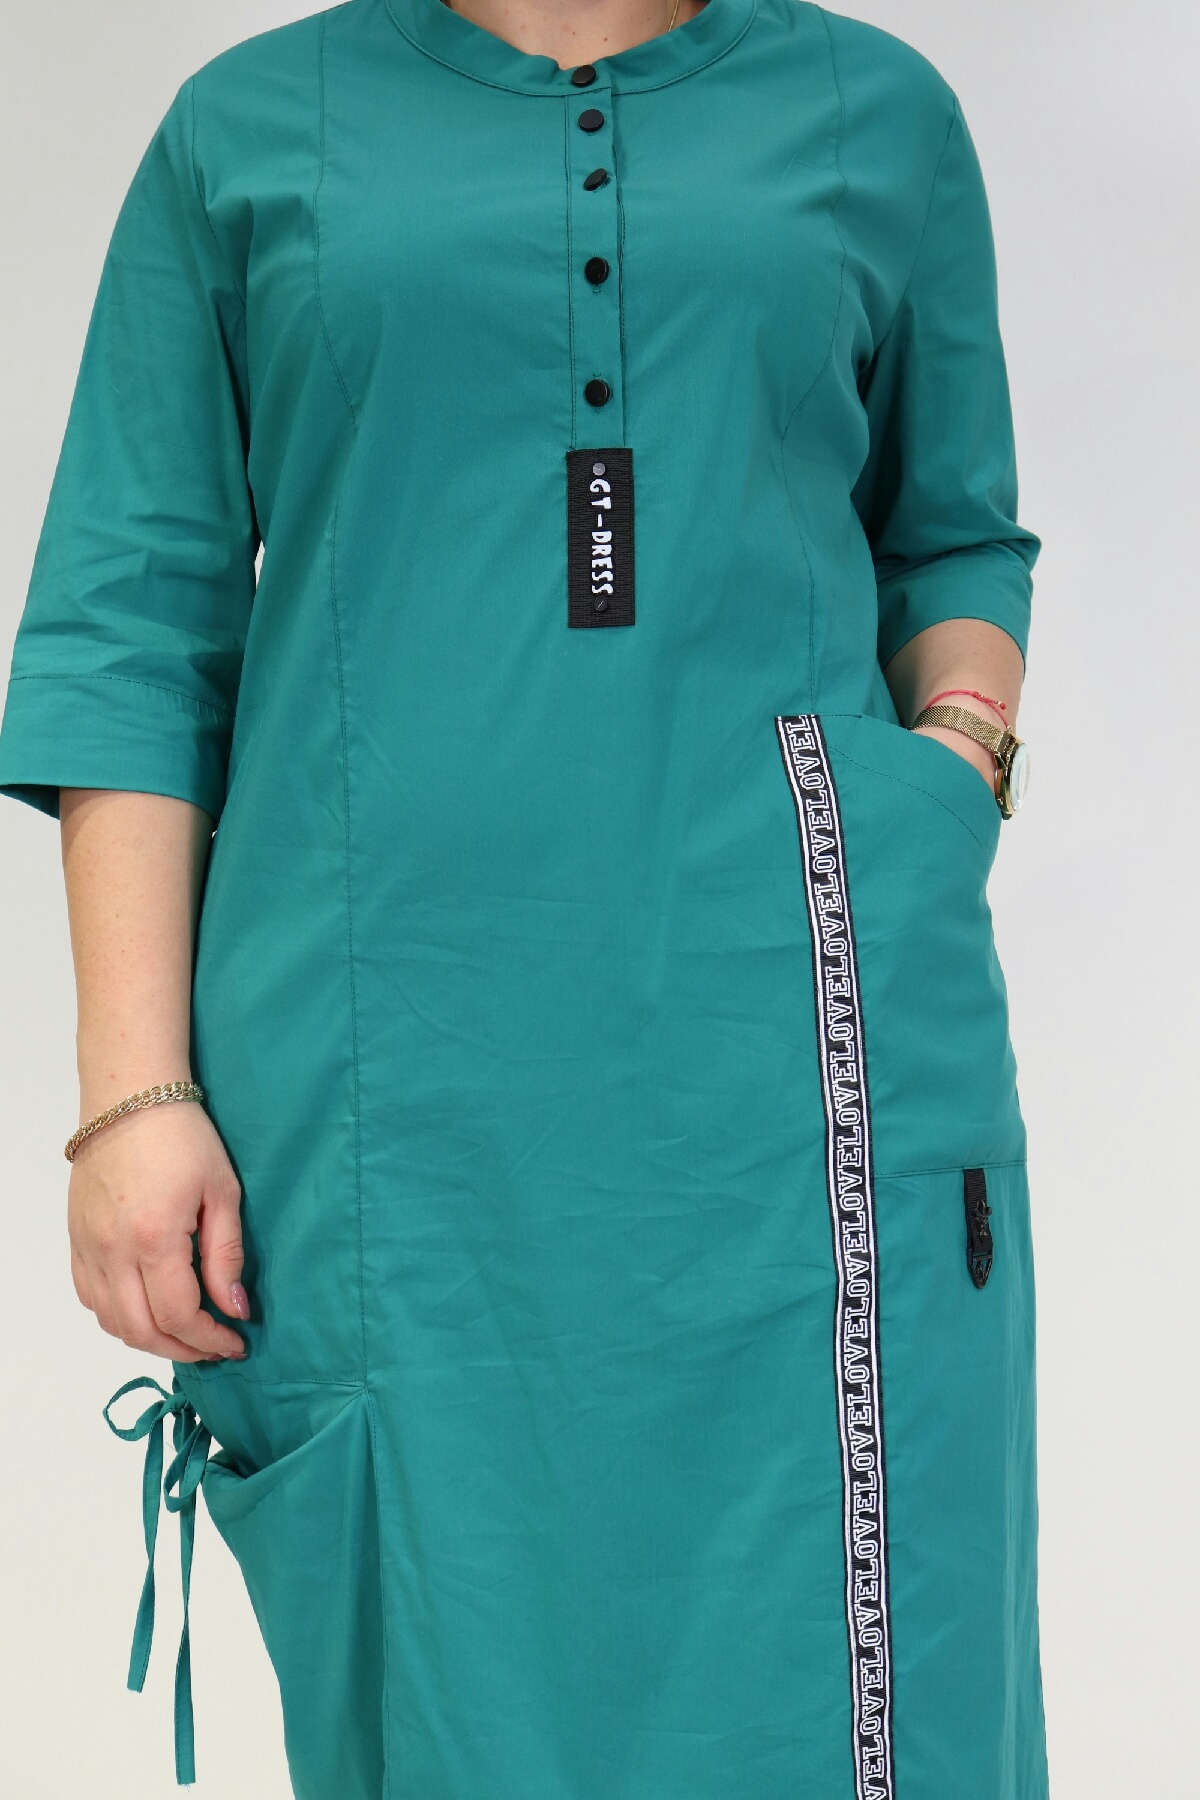 Day Dresses Medium-Light green